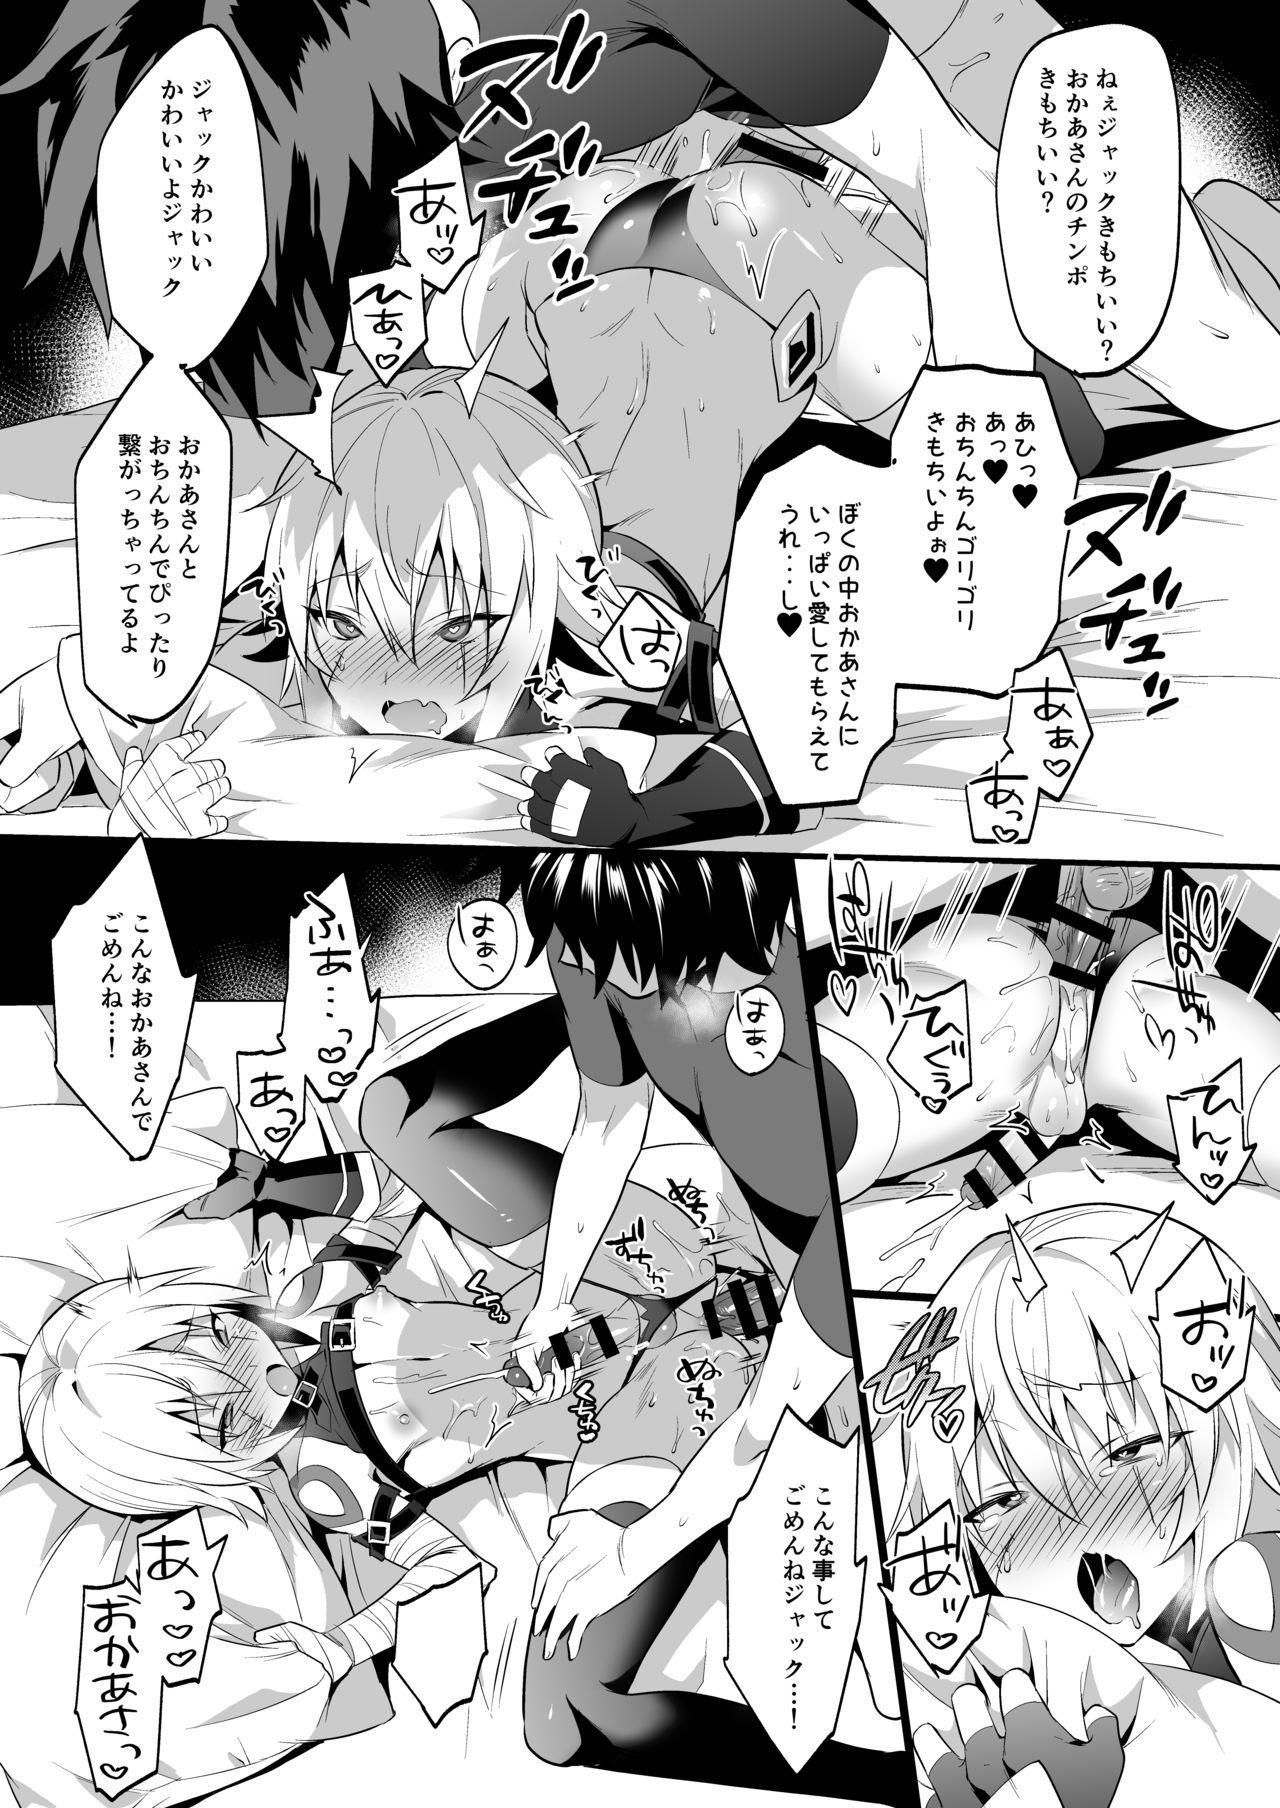 [Morittokoke (Morikoke)] Jack-kun wa Okaa-san to Issho (Fate/Grand Order) [Digital] 20